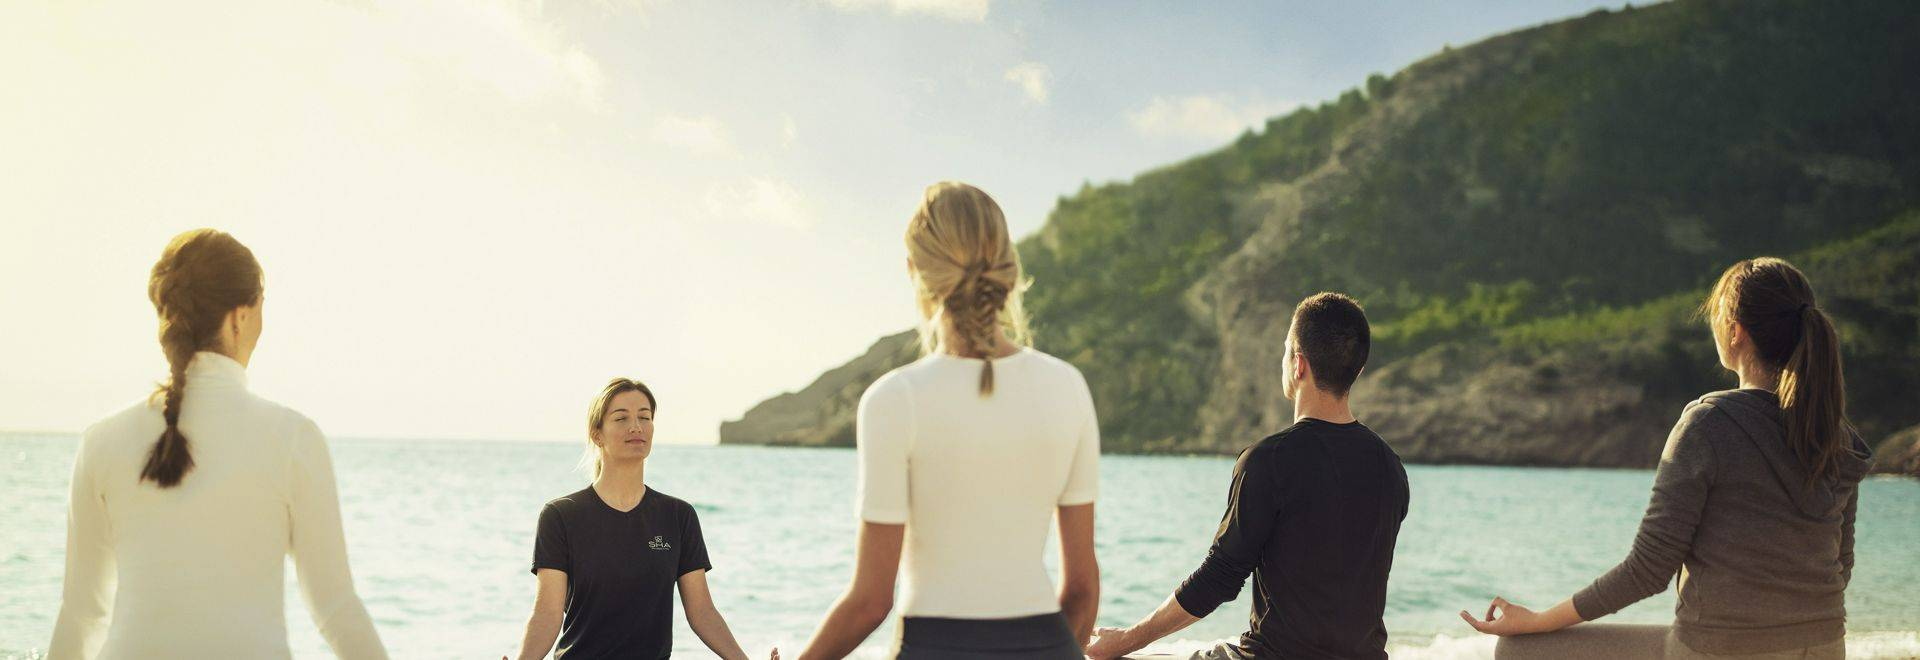 SHA-Wellness-Clinic-outdoor-meditation.jpg